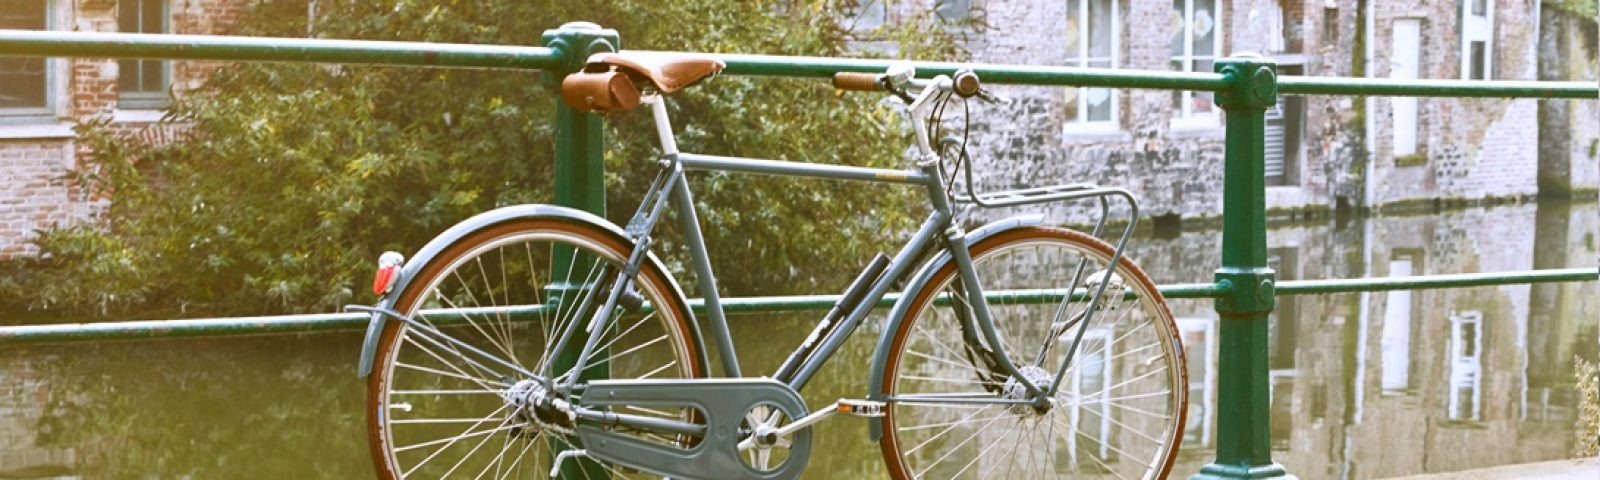 achielle retro fiets